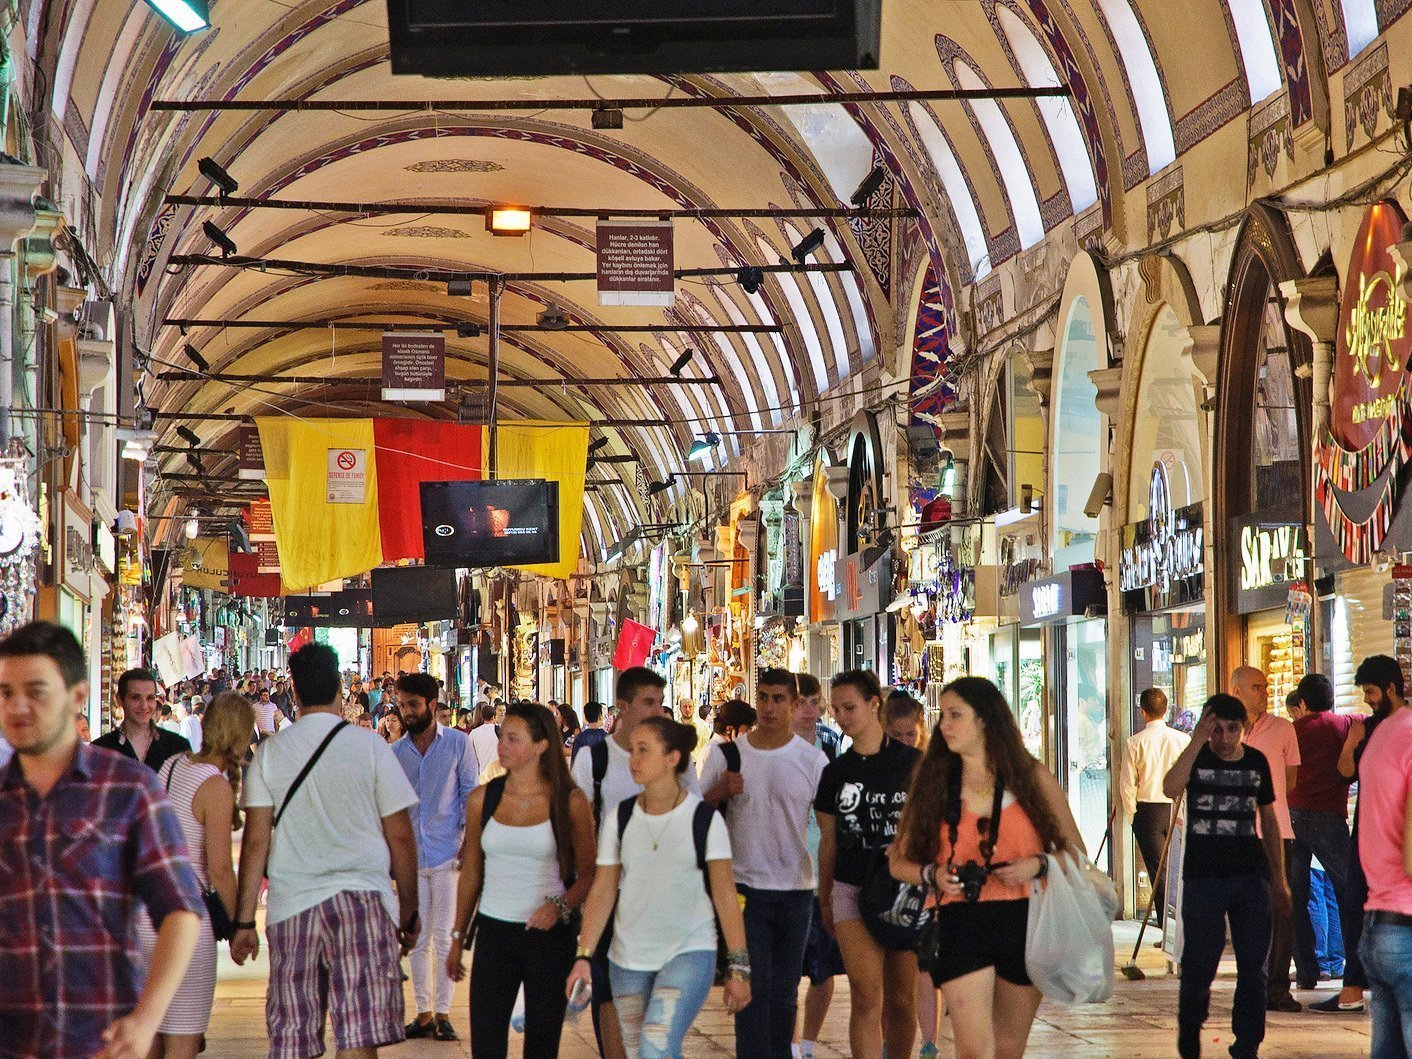 Турция туристы на стамбульском базаре